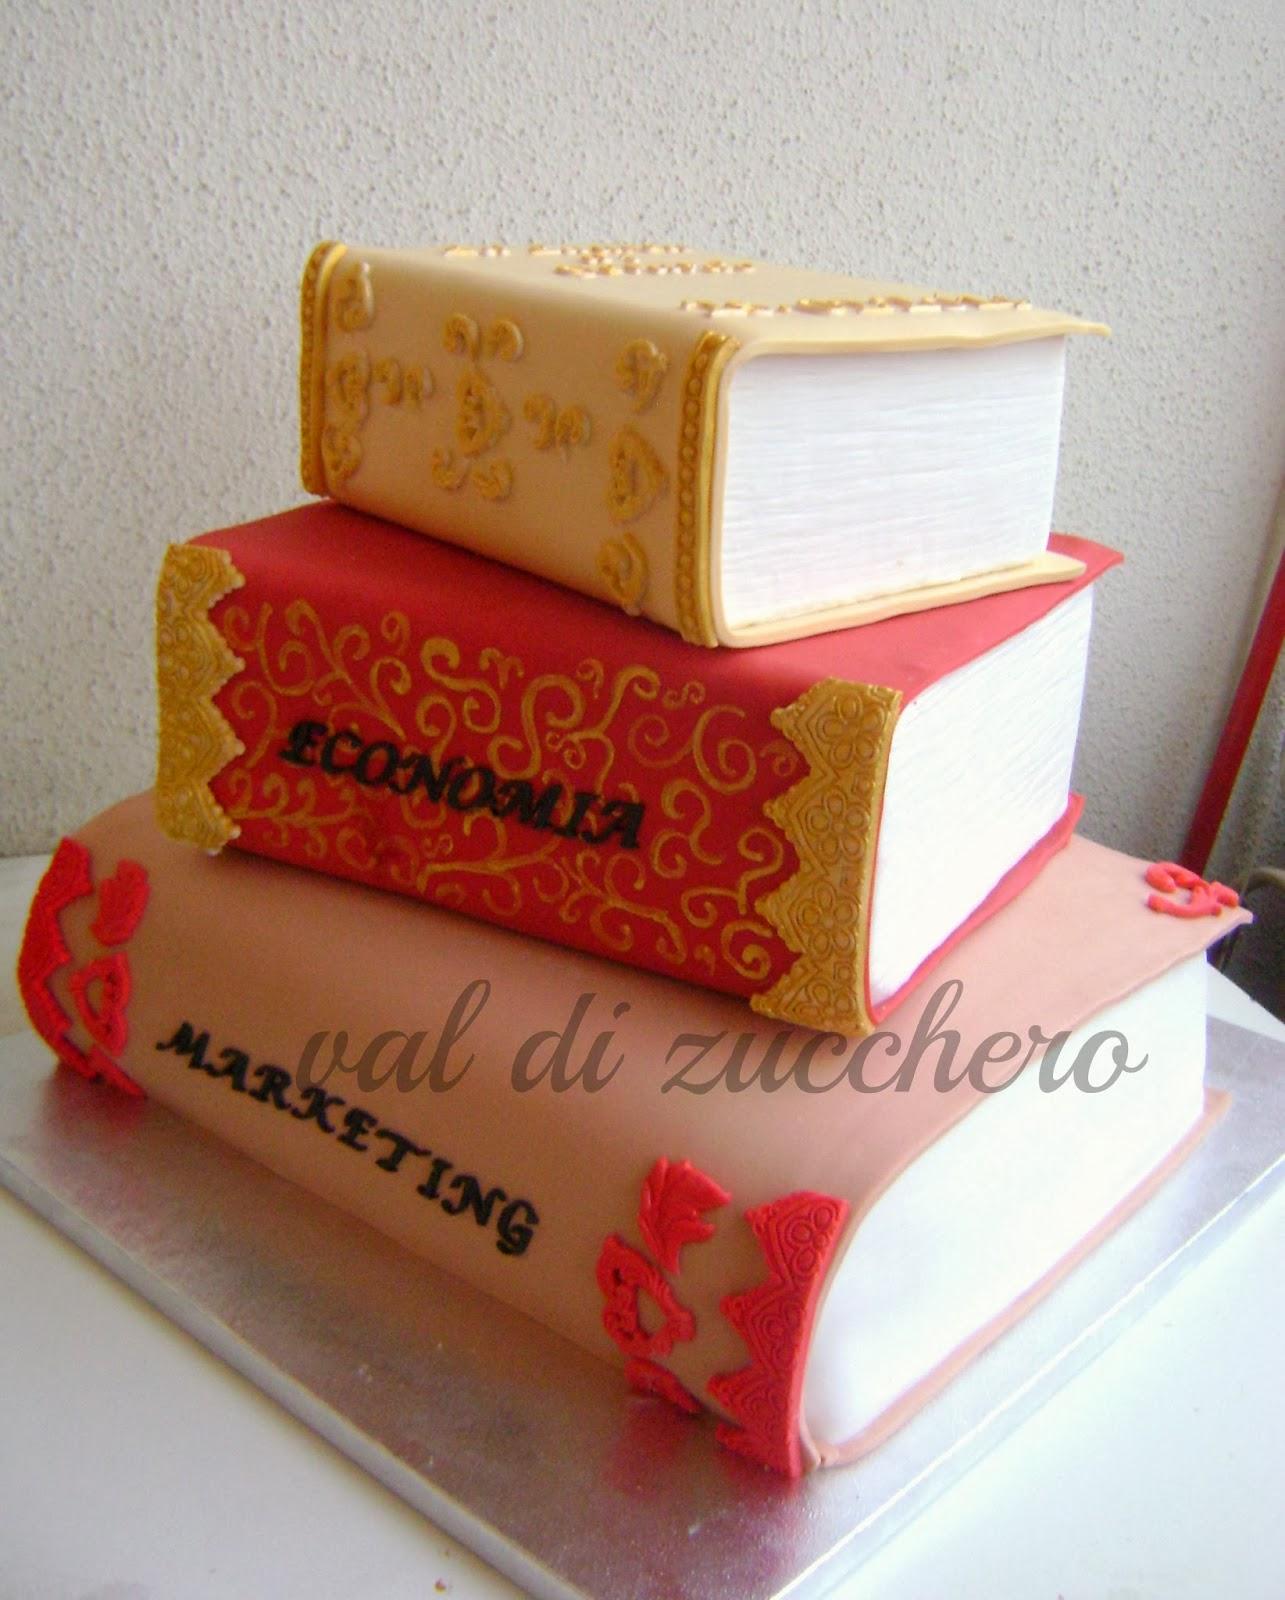 Val di zucchero: I libri... per una Laurea e Rapunzel!